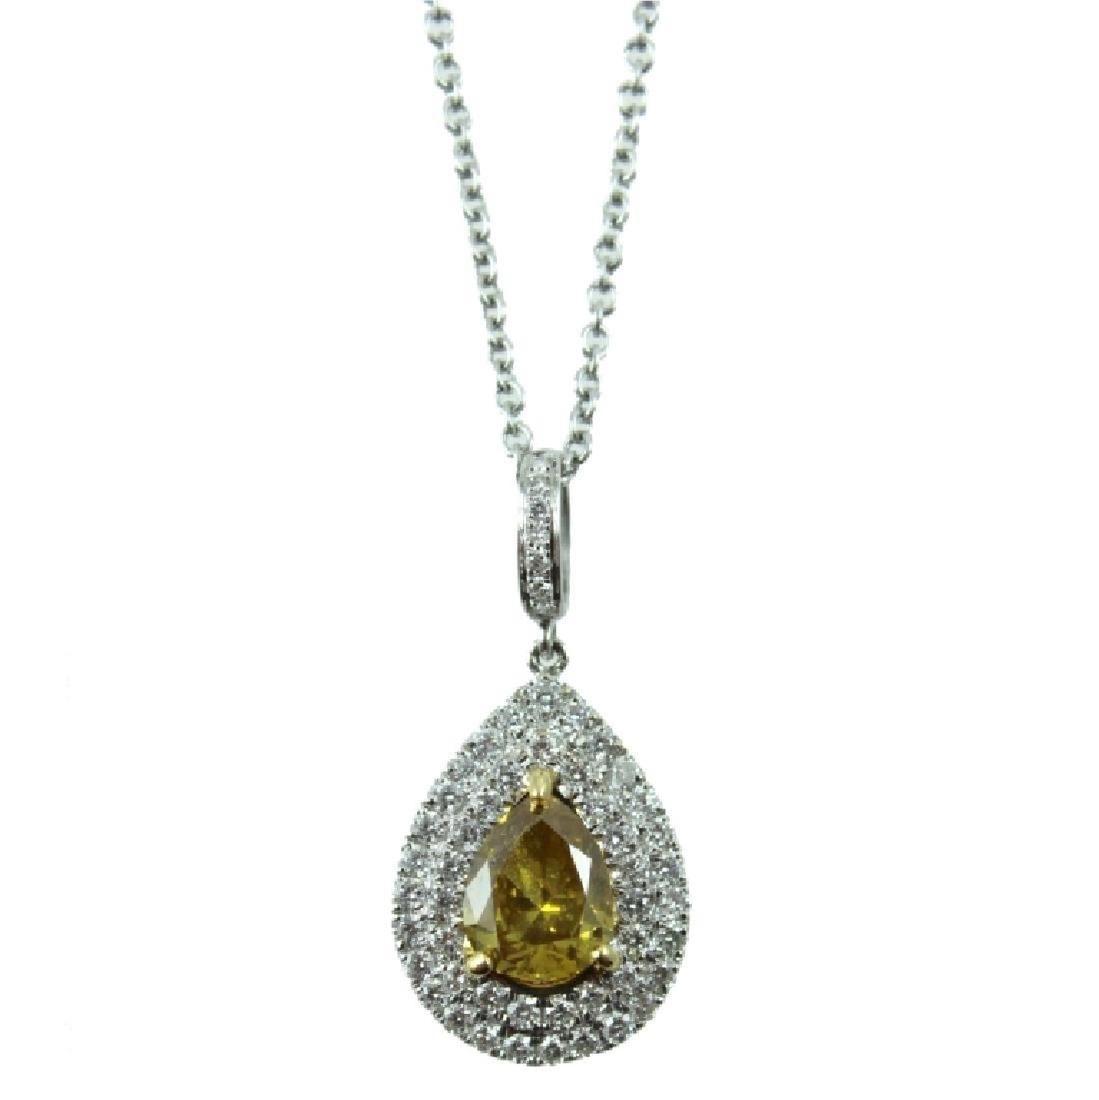 GIA CERTIFIED 1.28 CARAT PEAR SHAPE DIAMOND